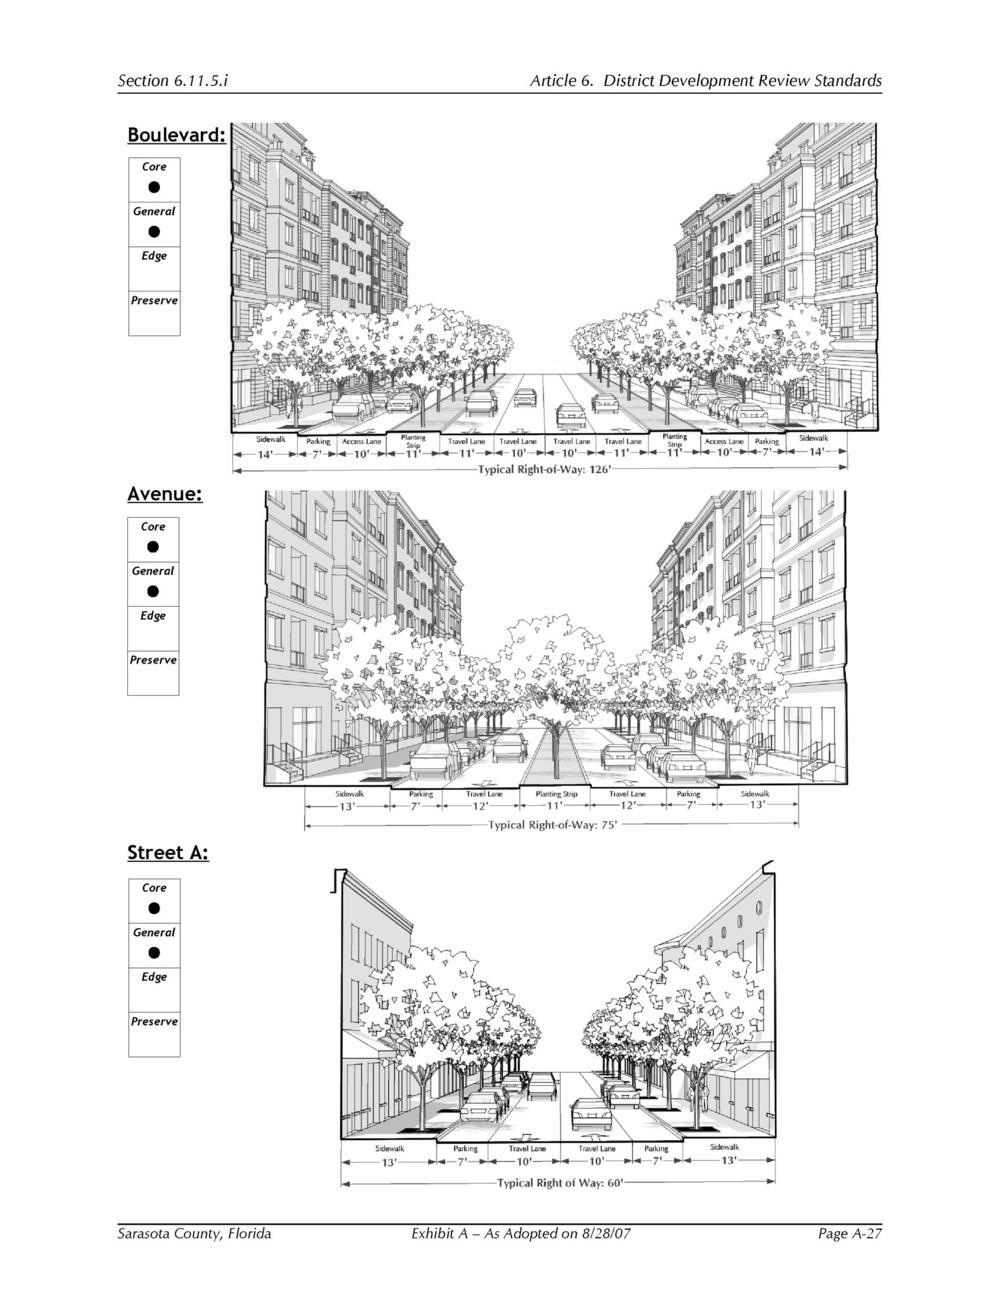 SarasotaCodeExhibitsABC-August28-2007higherquality_Page_27.jpg